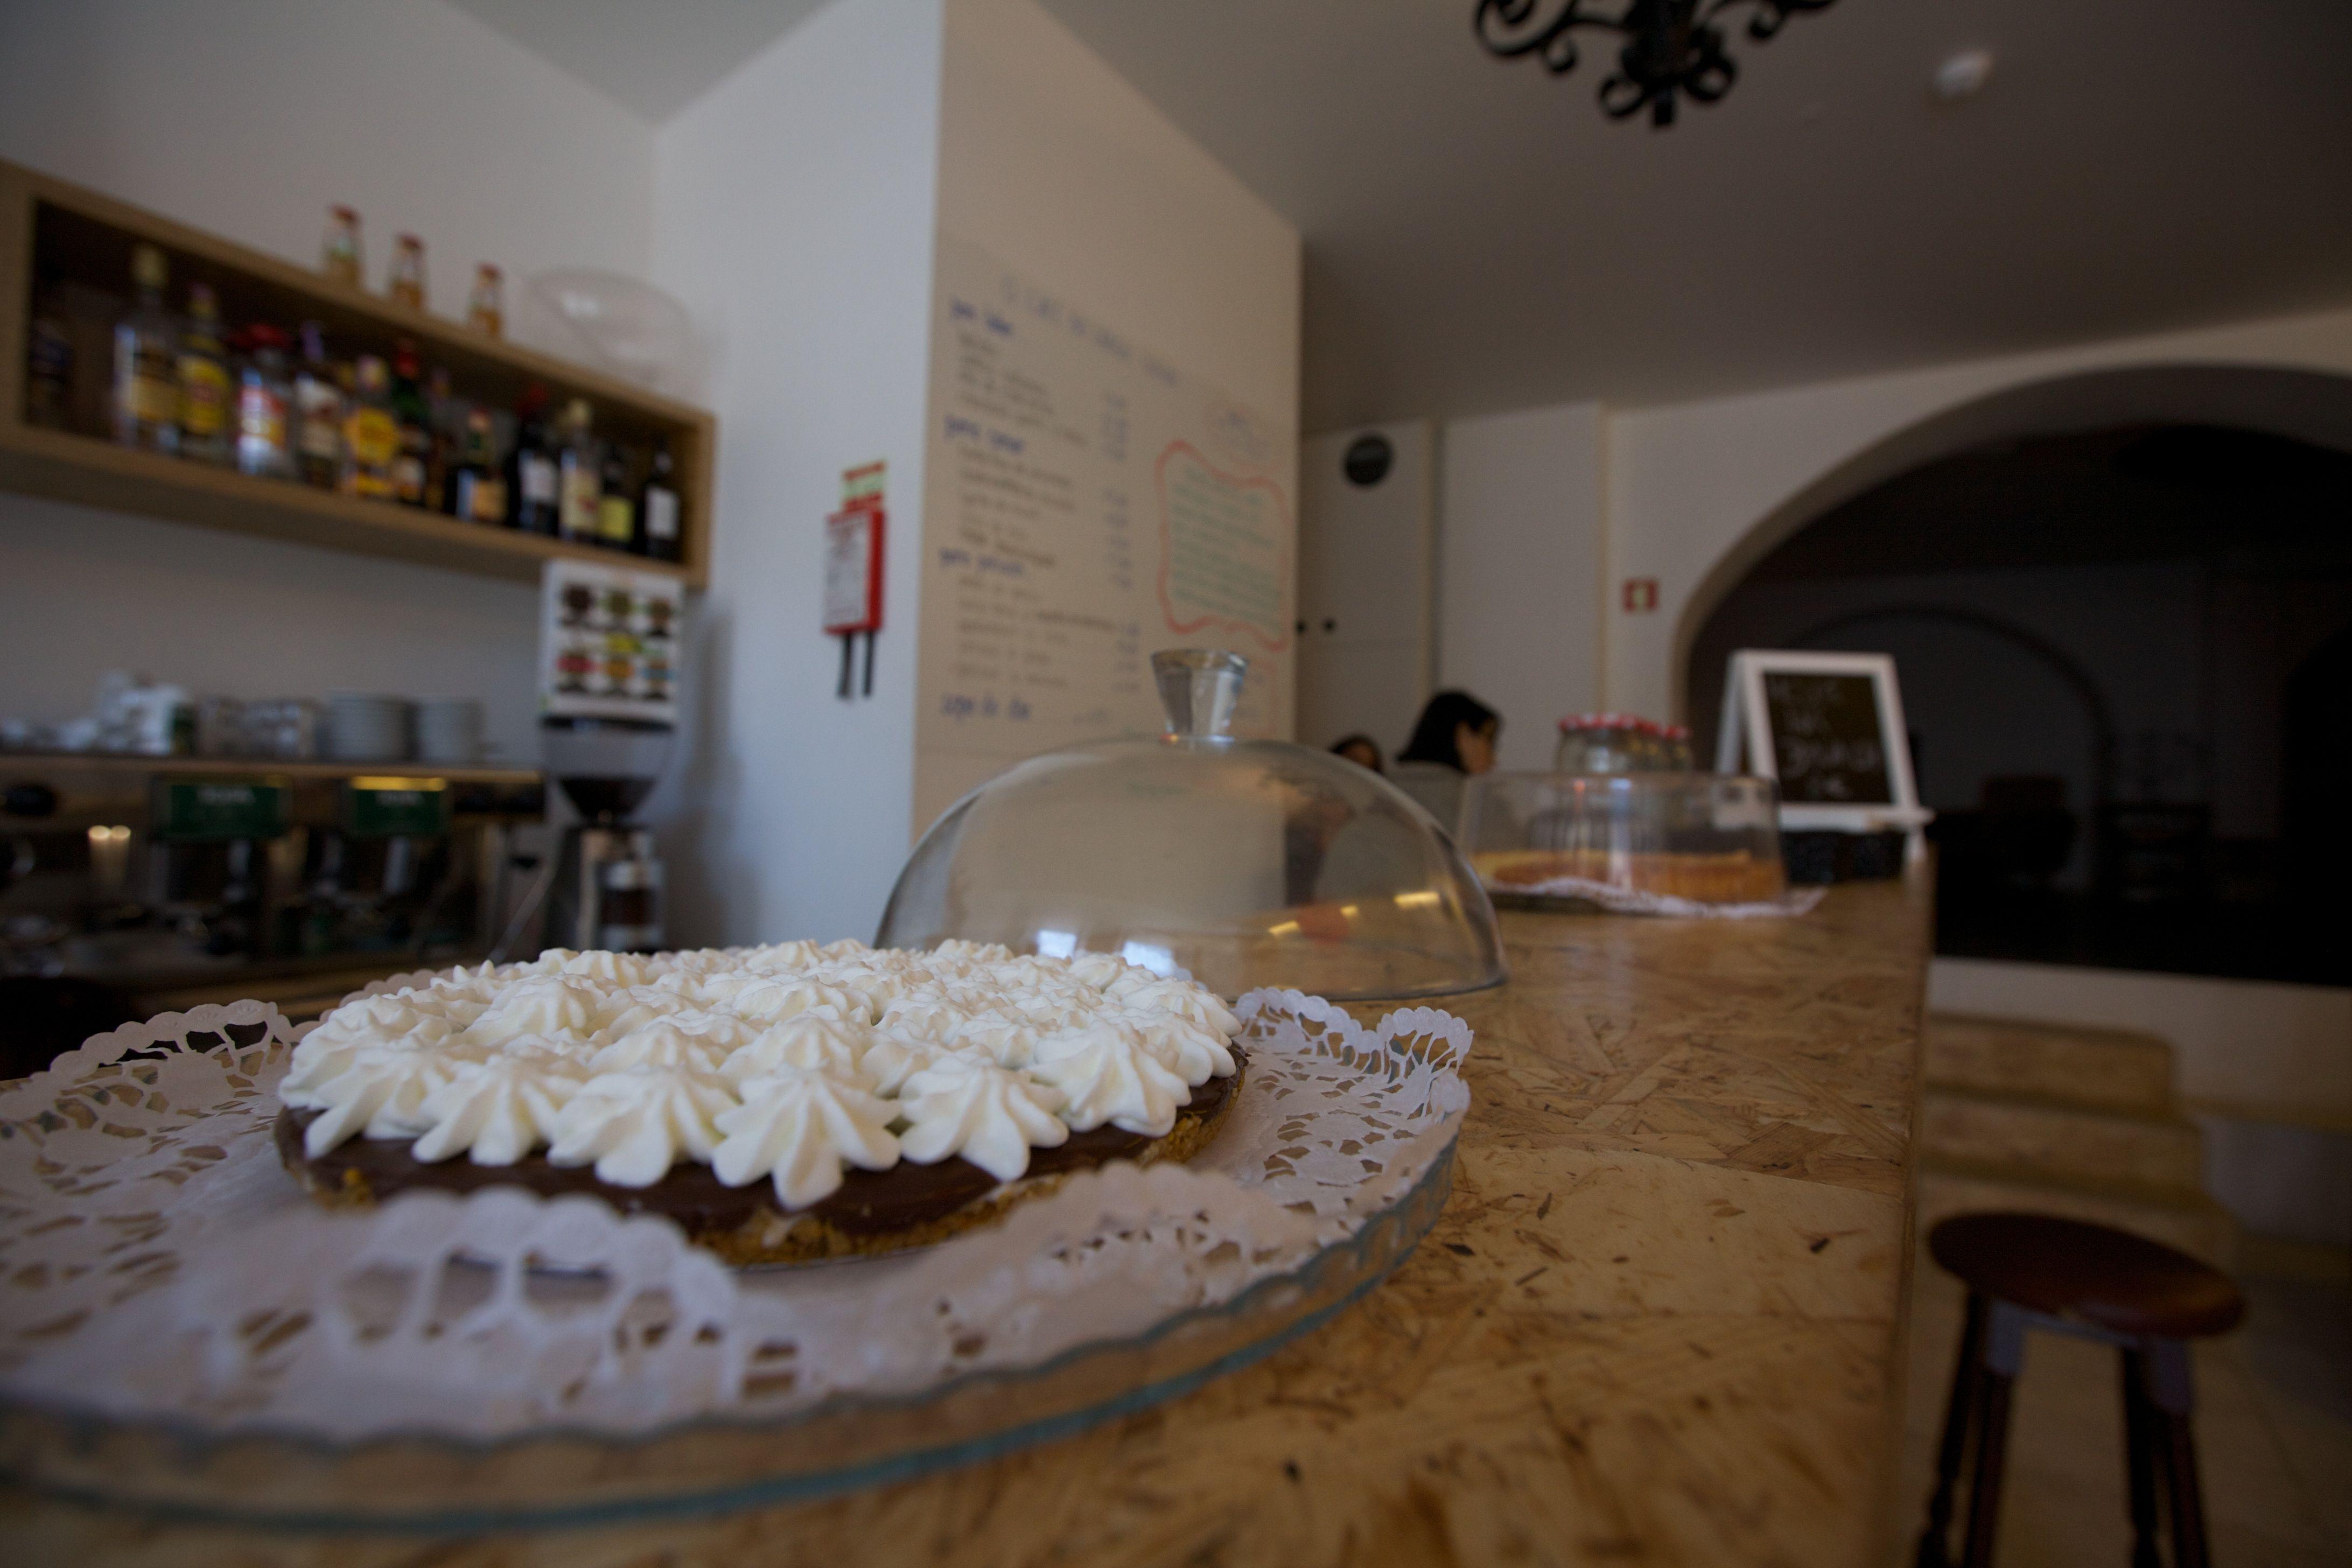 Largo Café Estúdio http://ambrosio.co/pt/places/largo-cafe-estudio